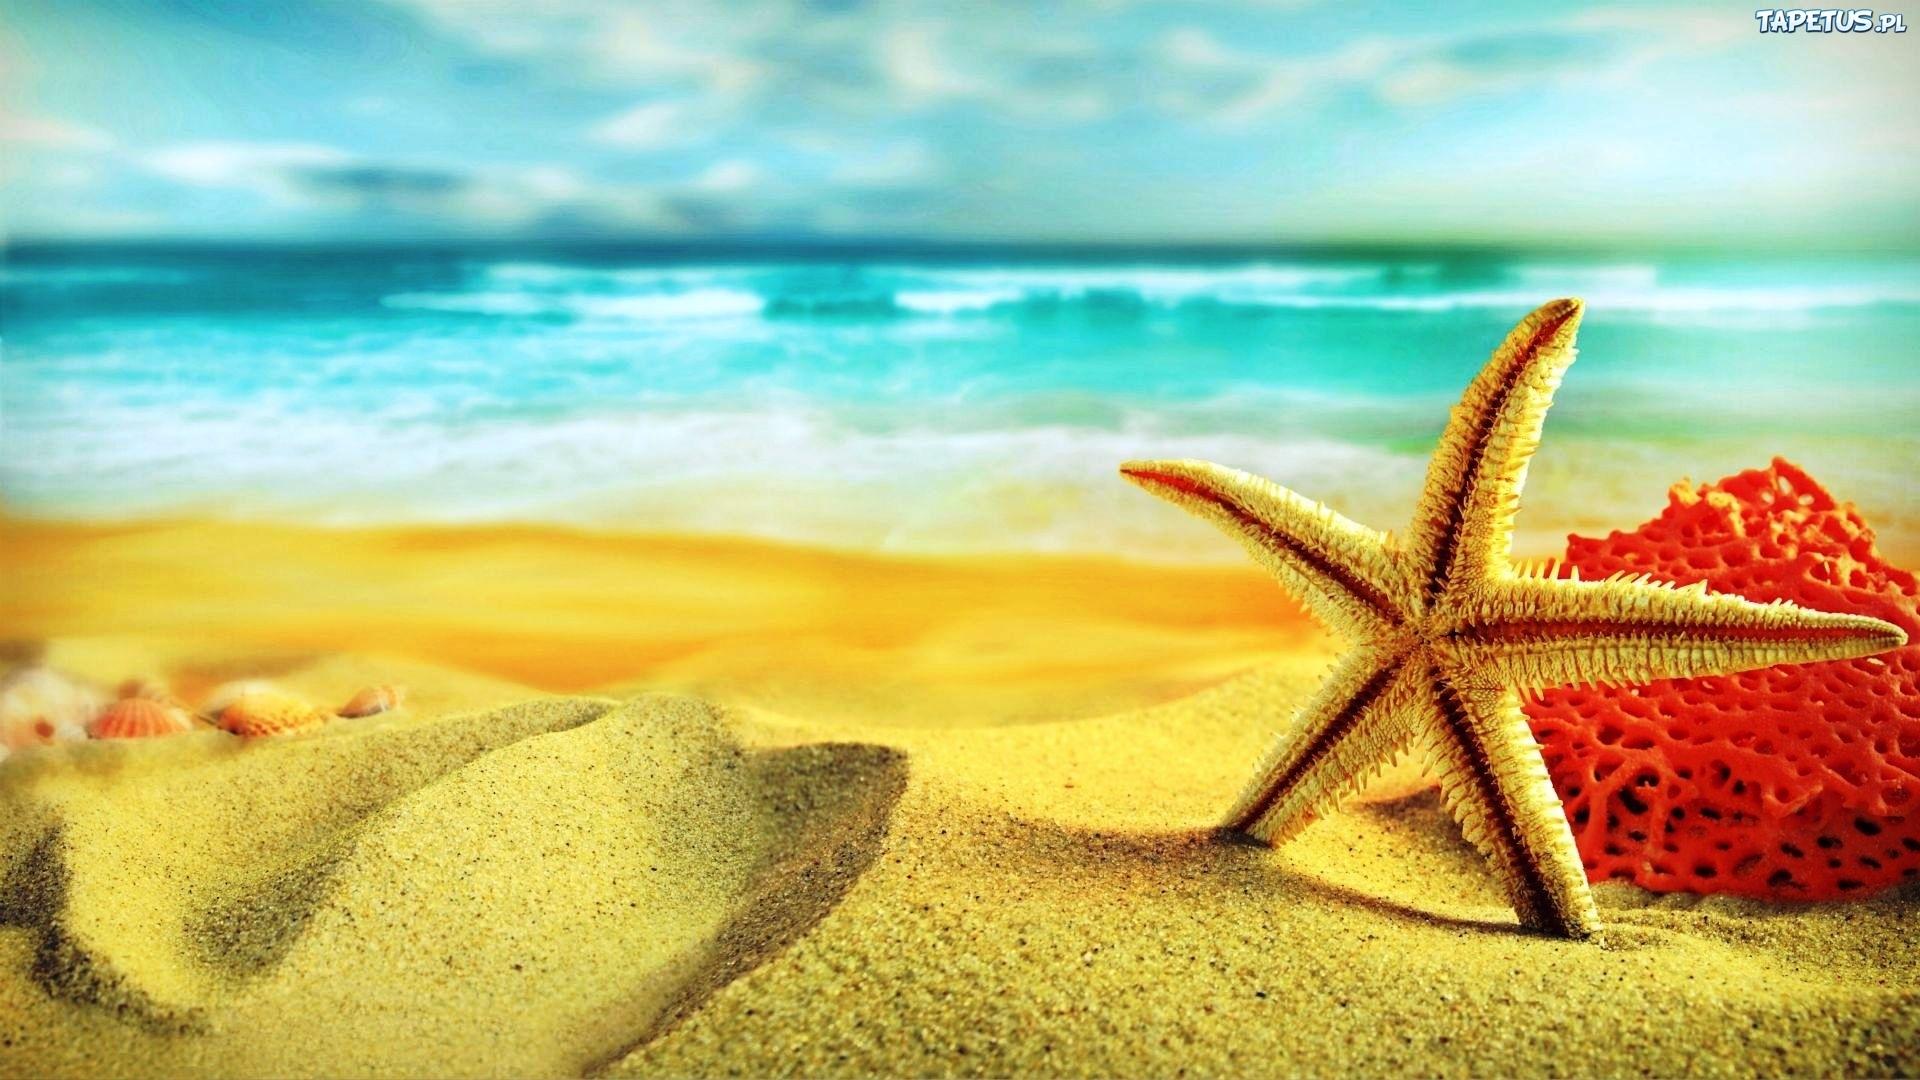 природа раковины песок пляж морская звезда nature shell sand the beach sea star без смс